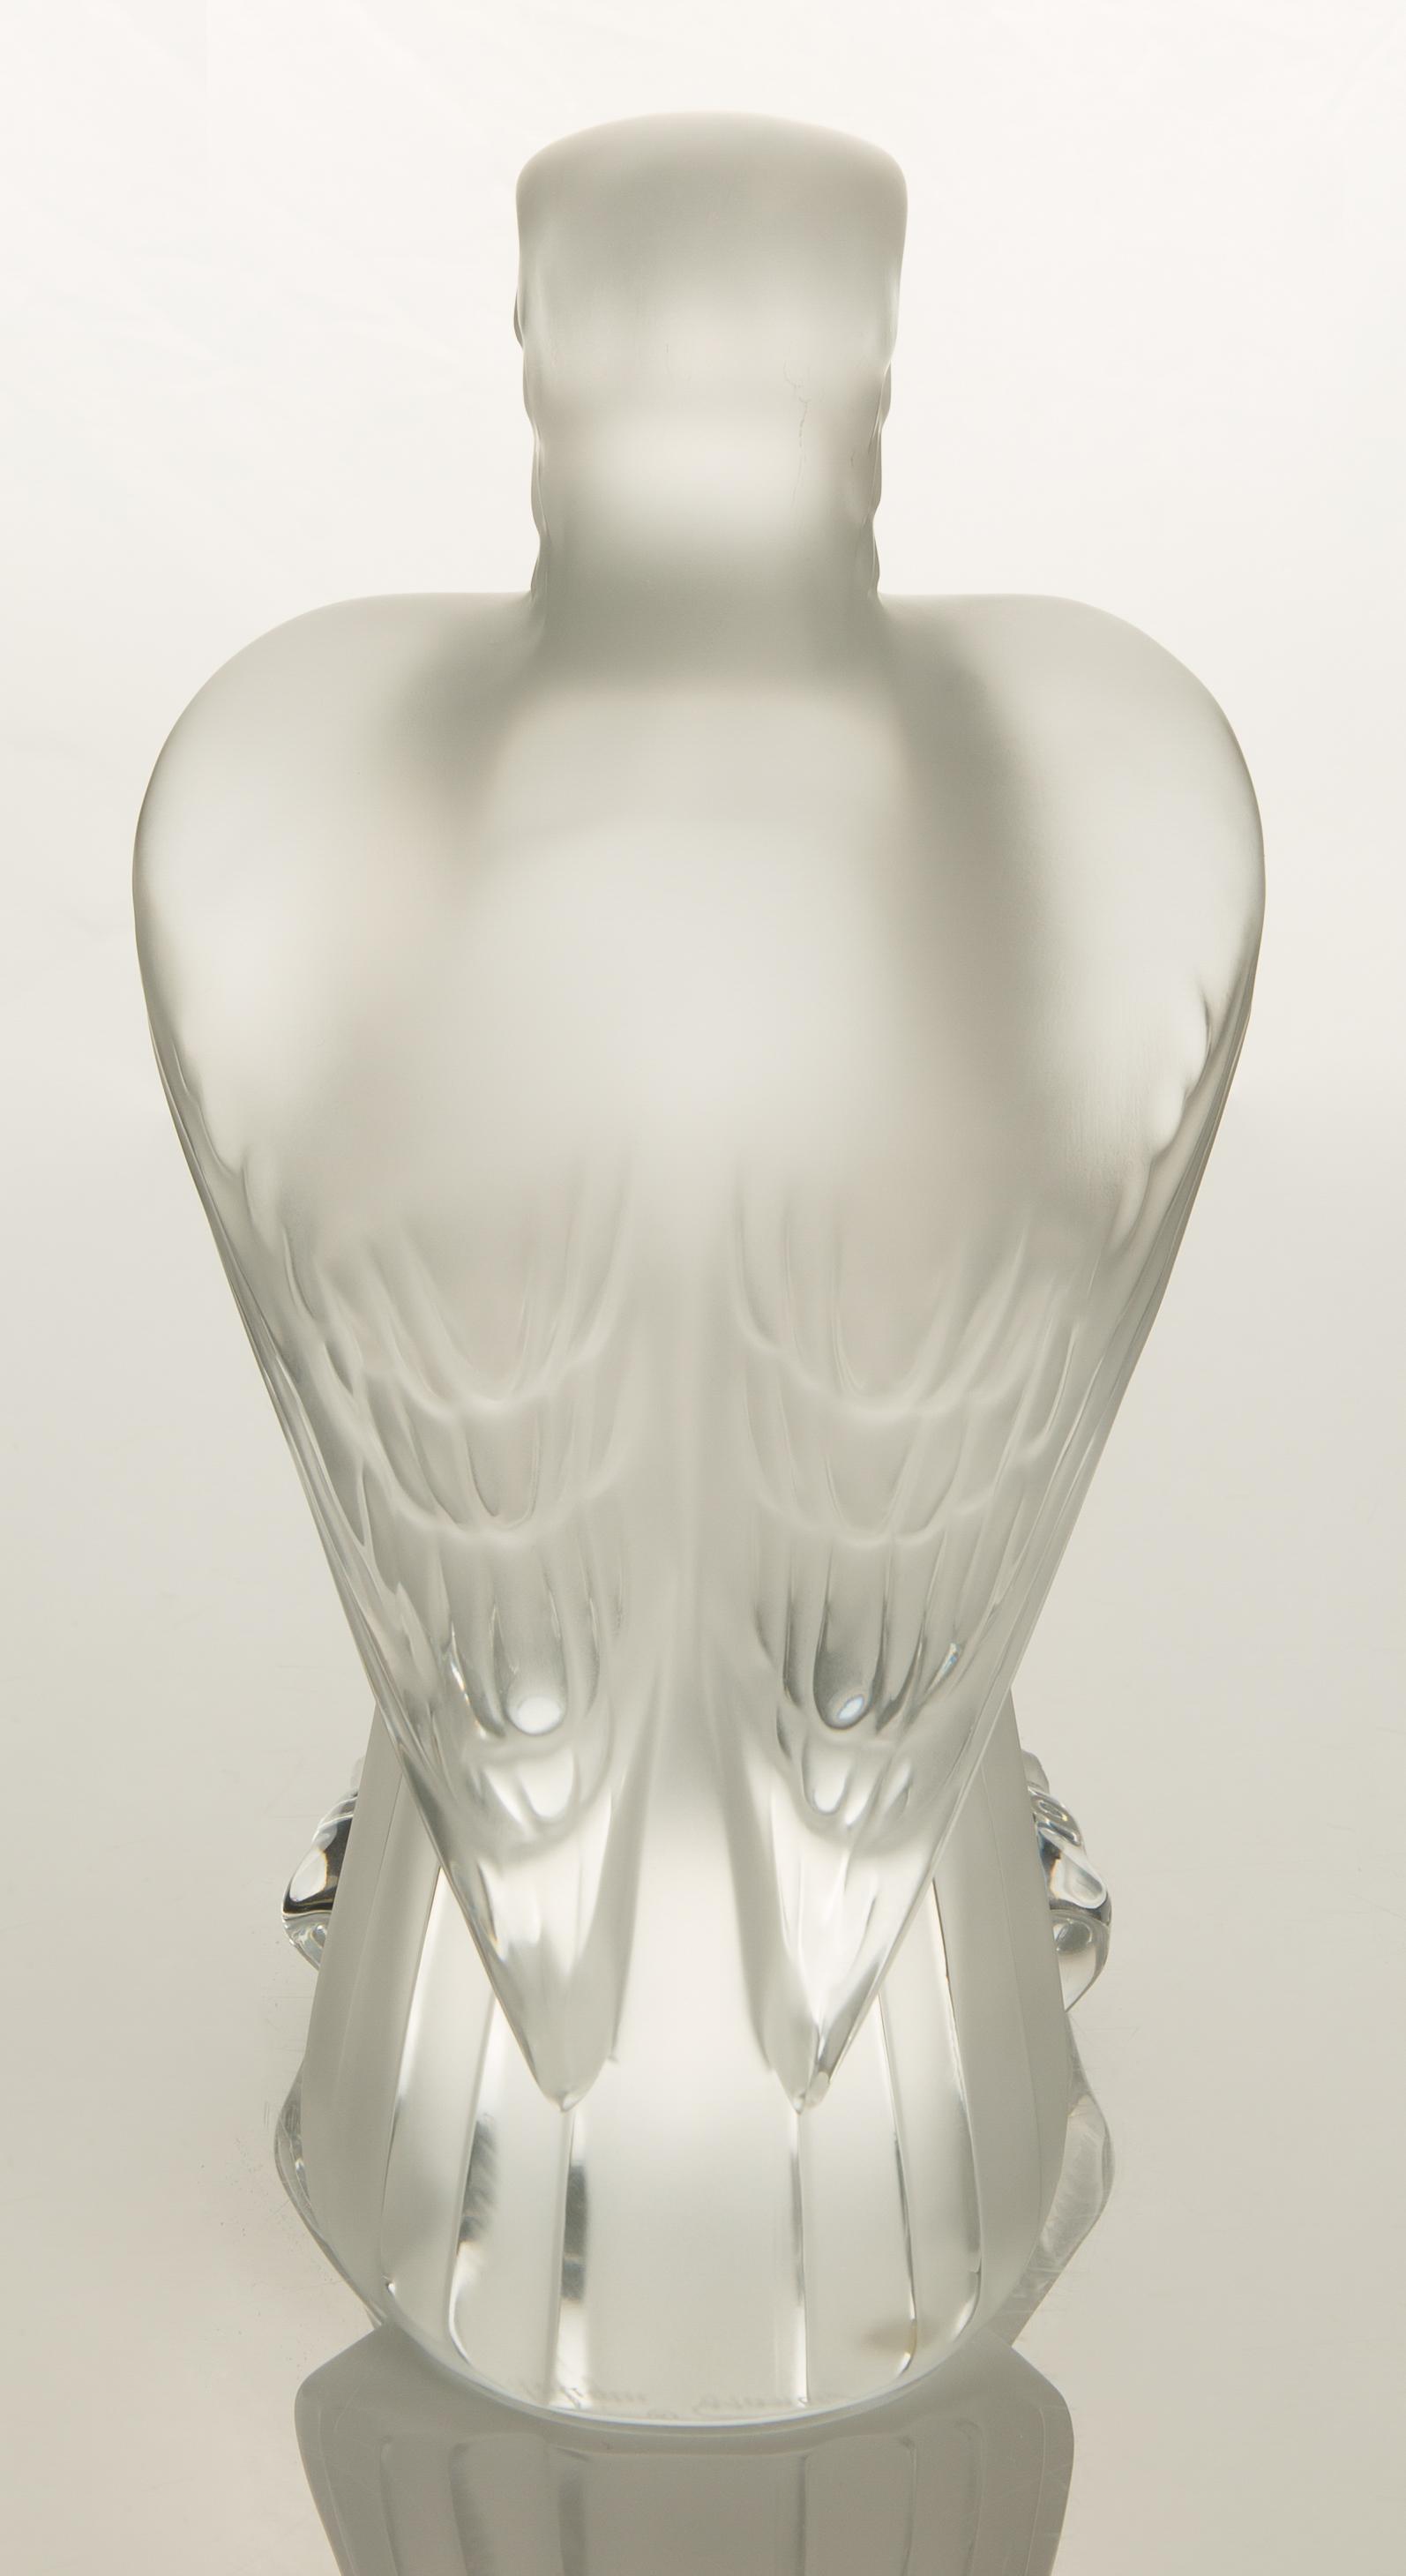 DESIGNED 1975 BY MARC LALIQUE LALIQUE 'LIBERTY' EAGLE - Image 2 of 3